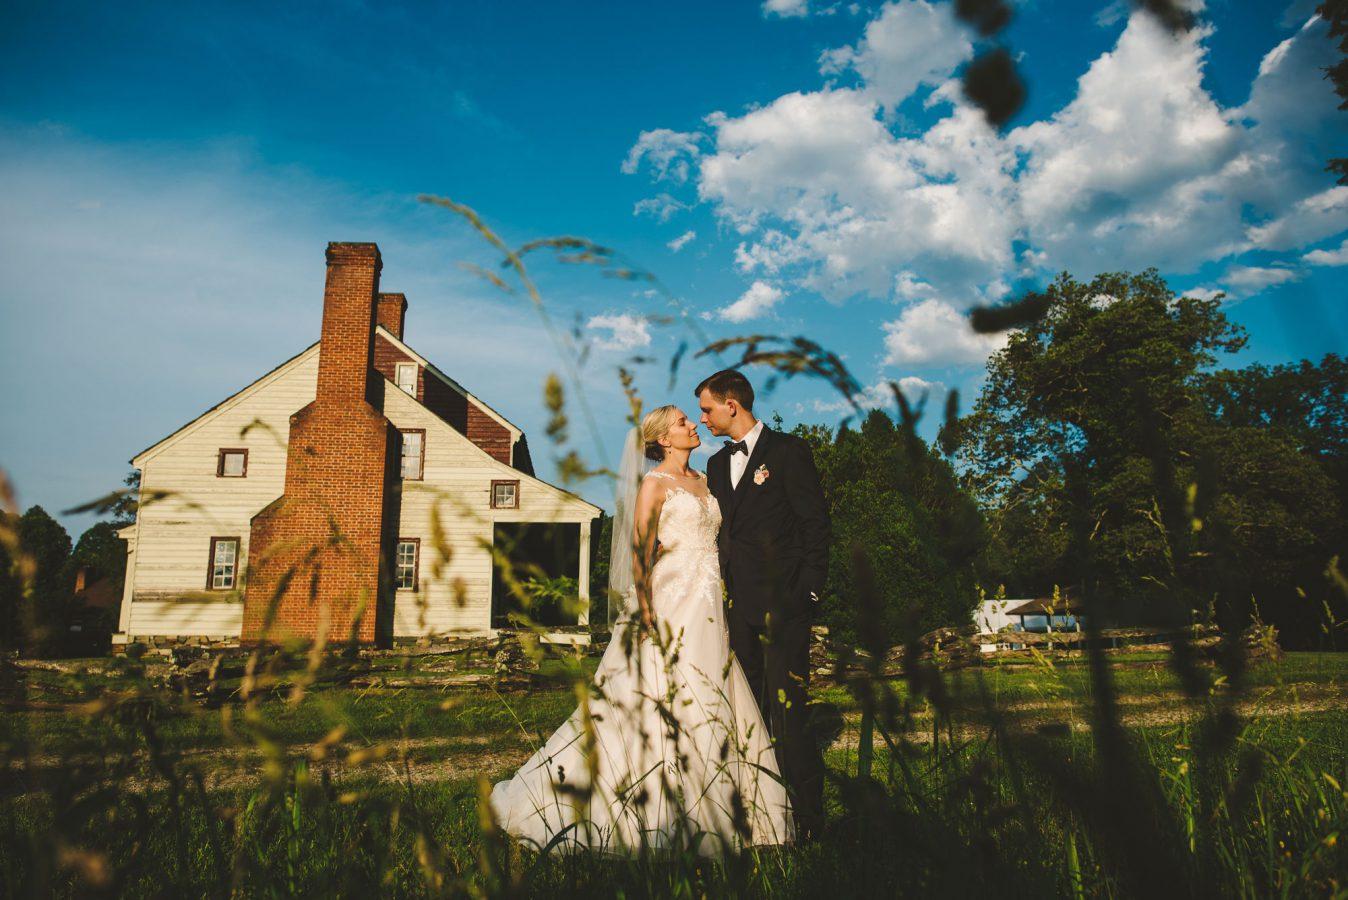 fete-photography-weddings-2017-009